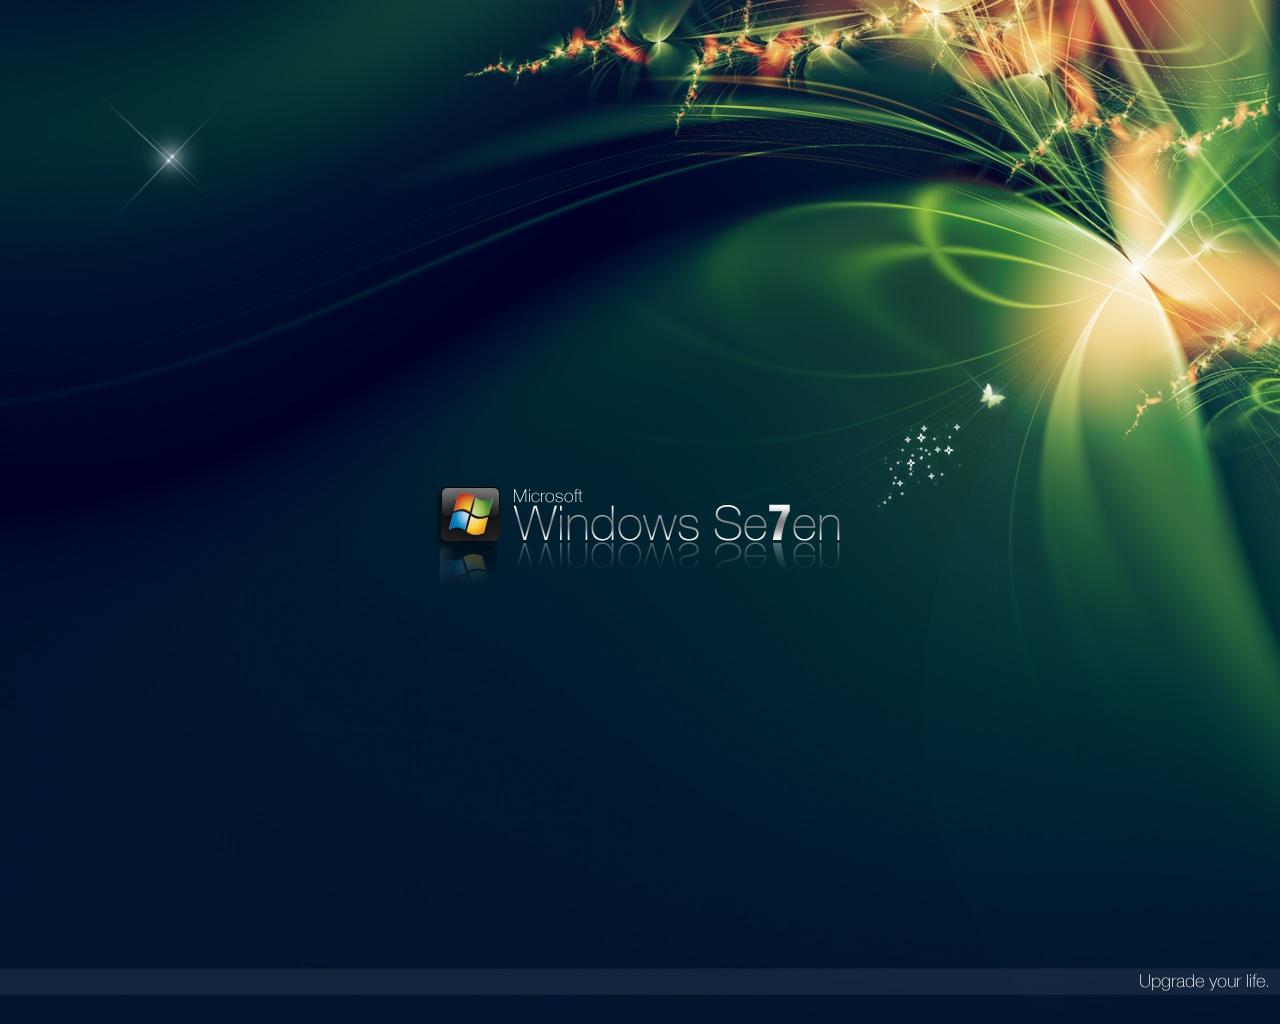 1280x1024 Green Windows 7 desktop PC and Mac wallpaper 1280x1024